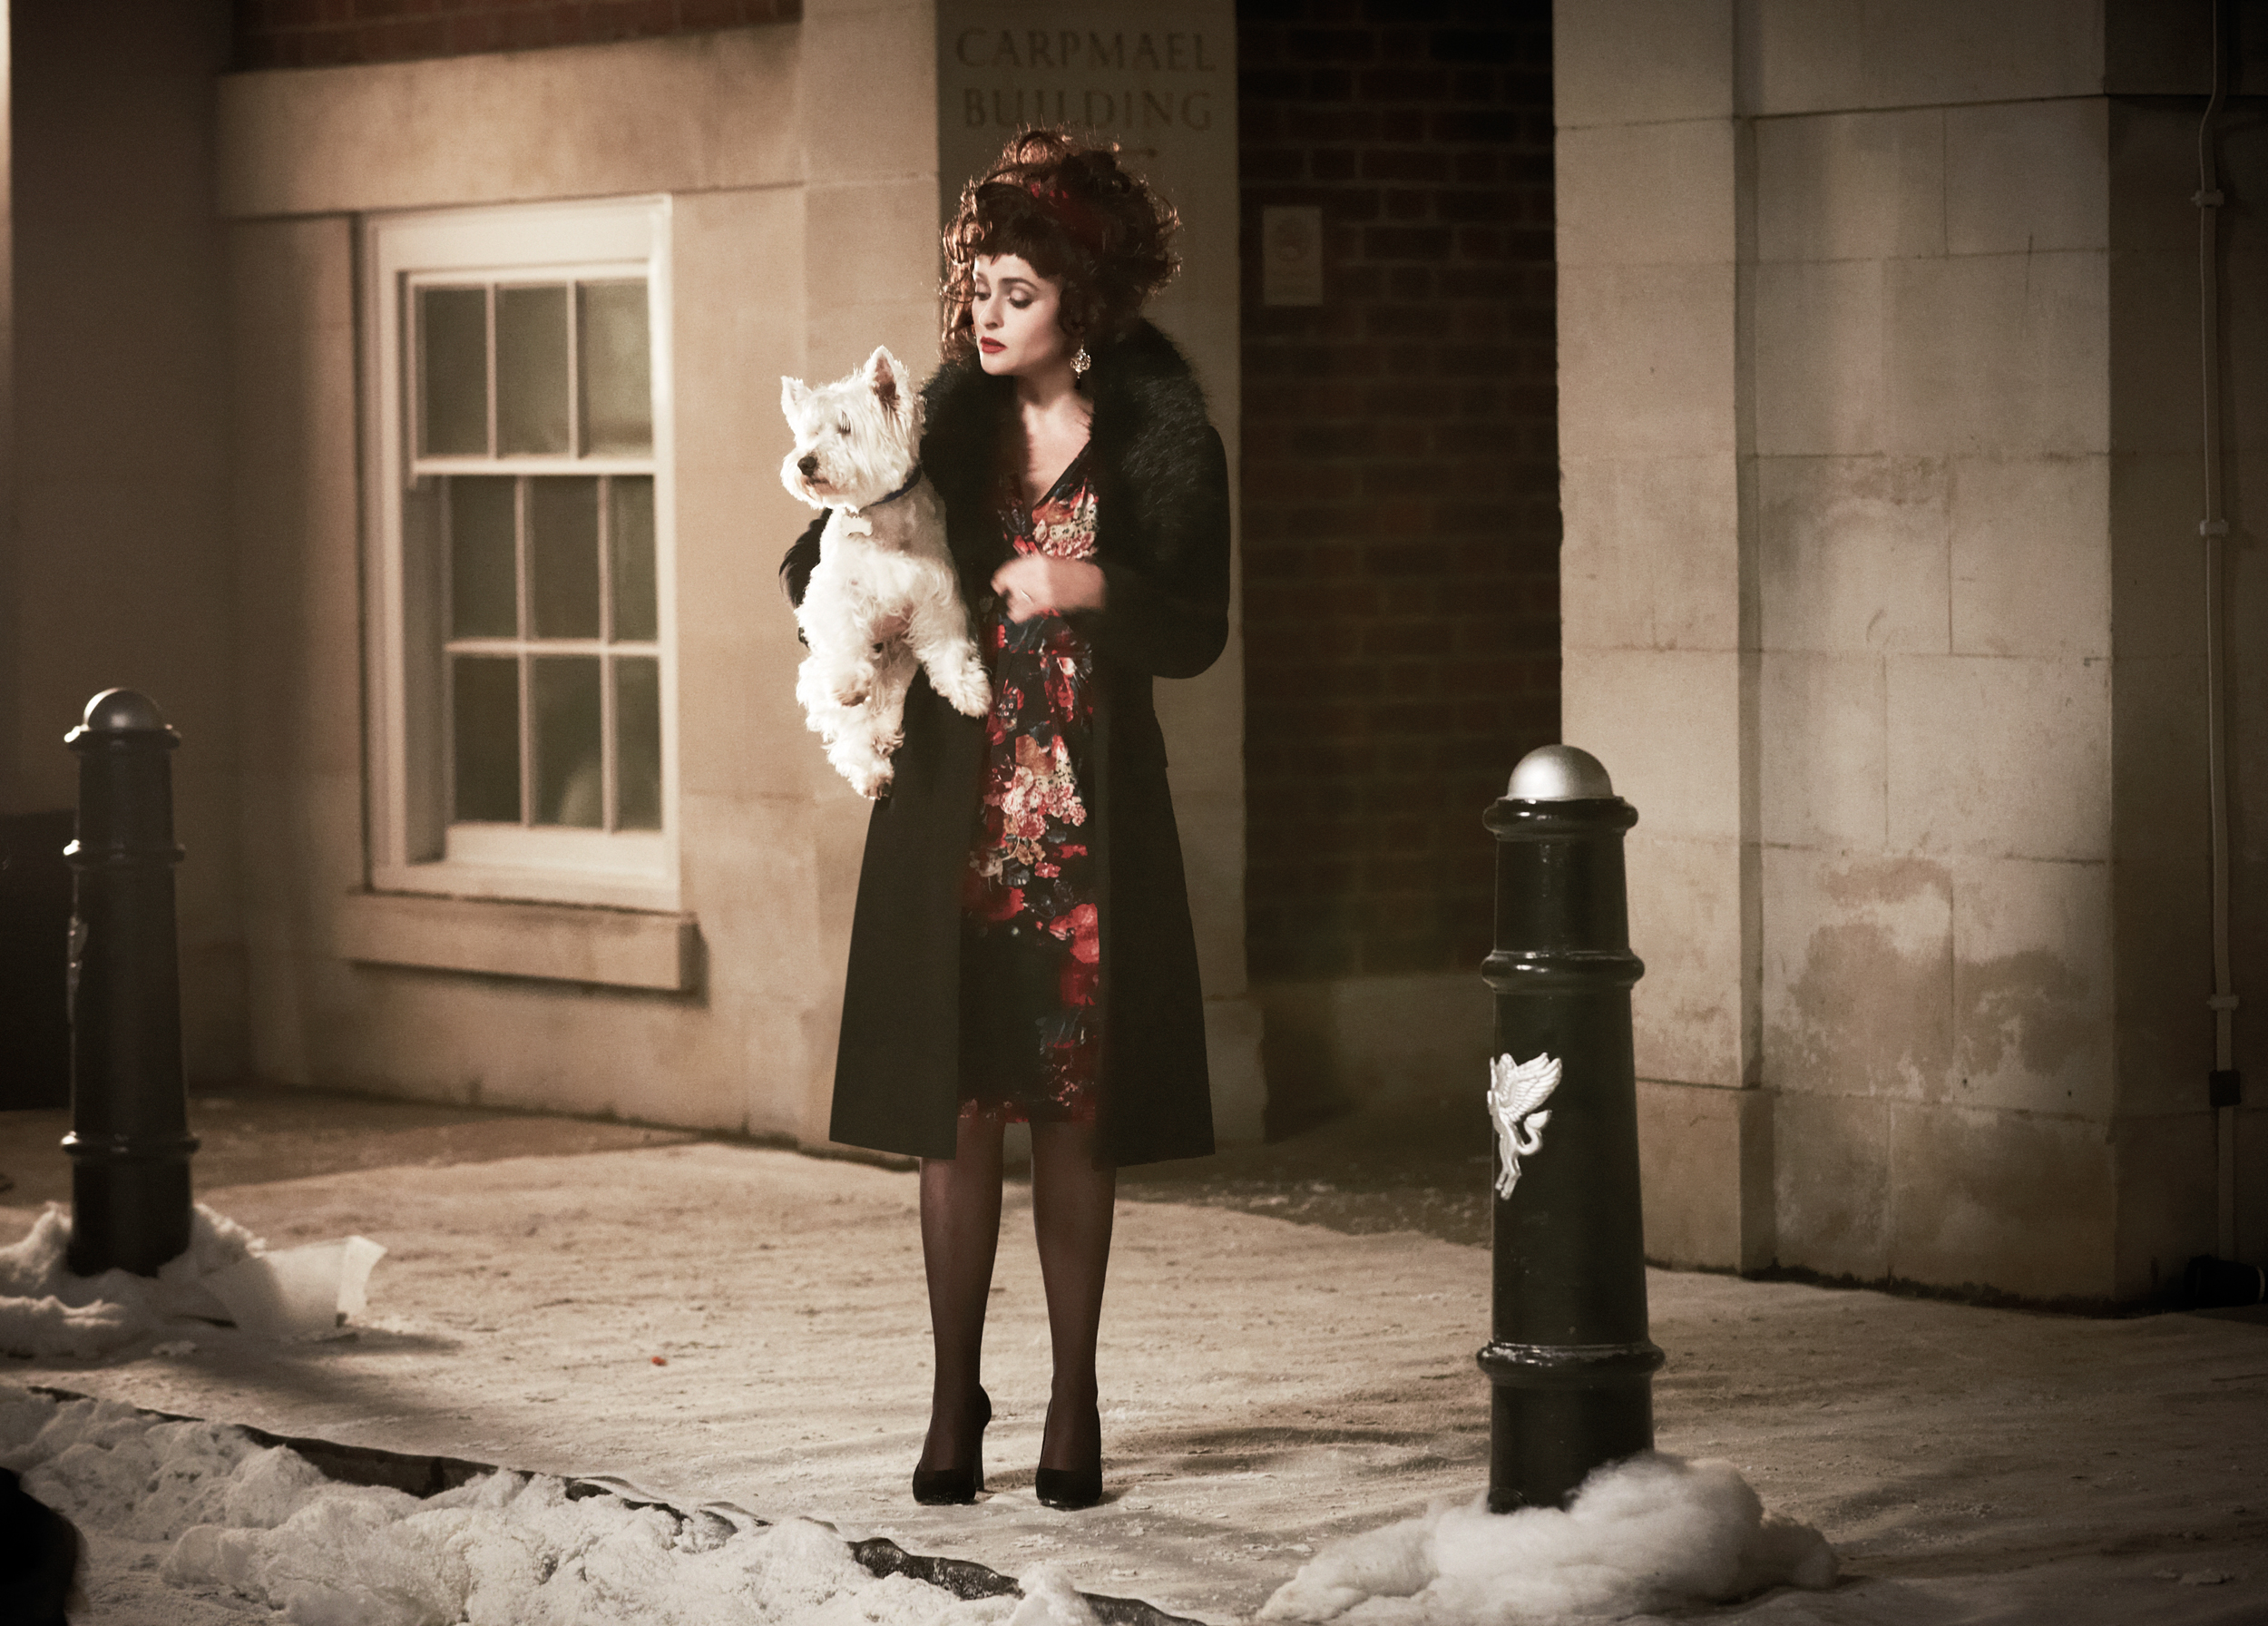 Helena Bonham Carter stars in the M&S Christmas ad (Picture: Marks & Spencer)